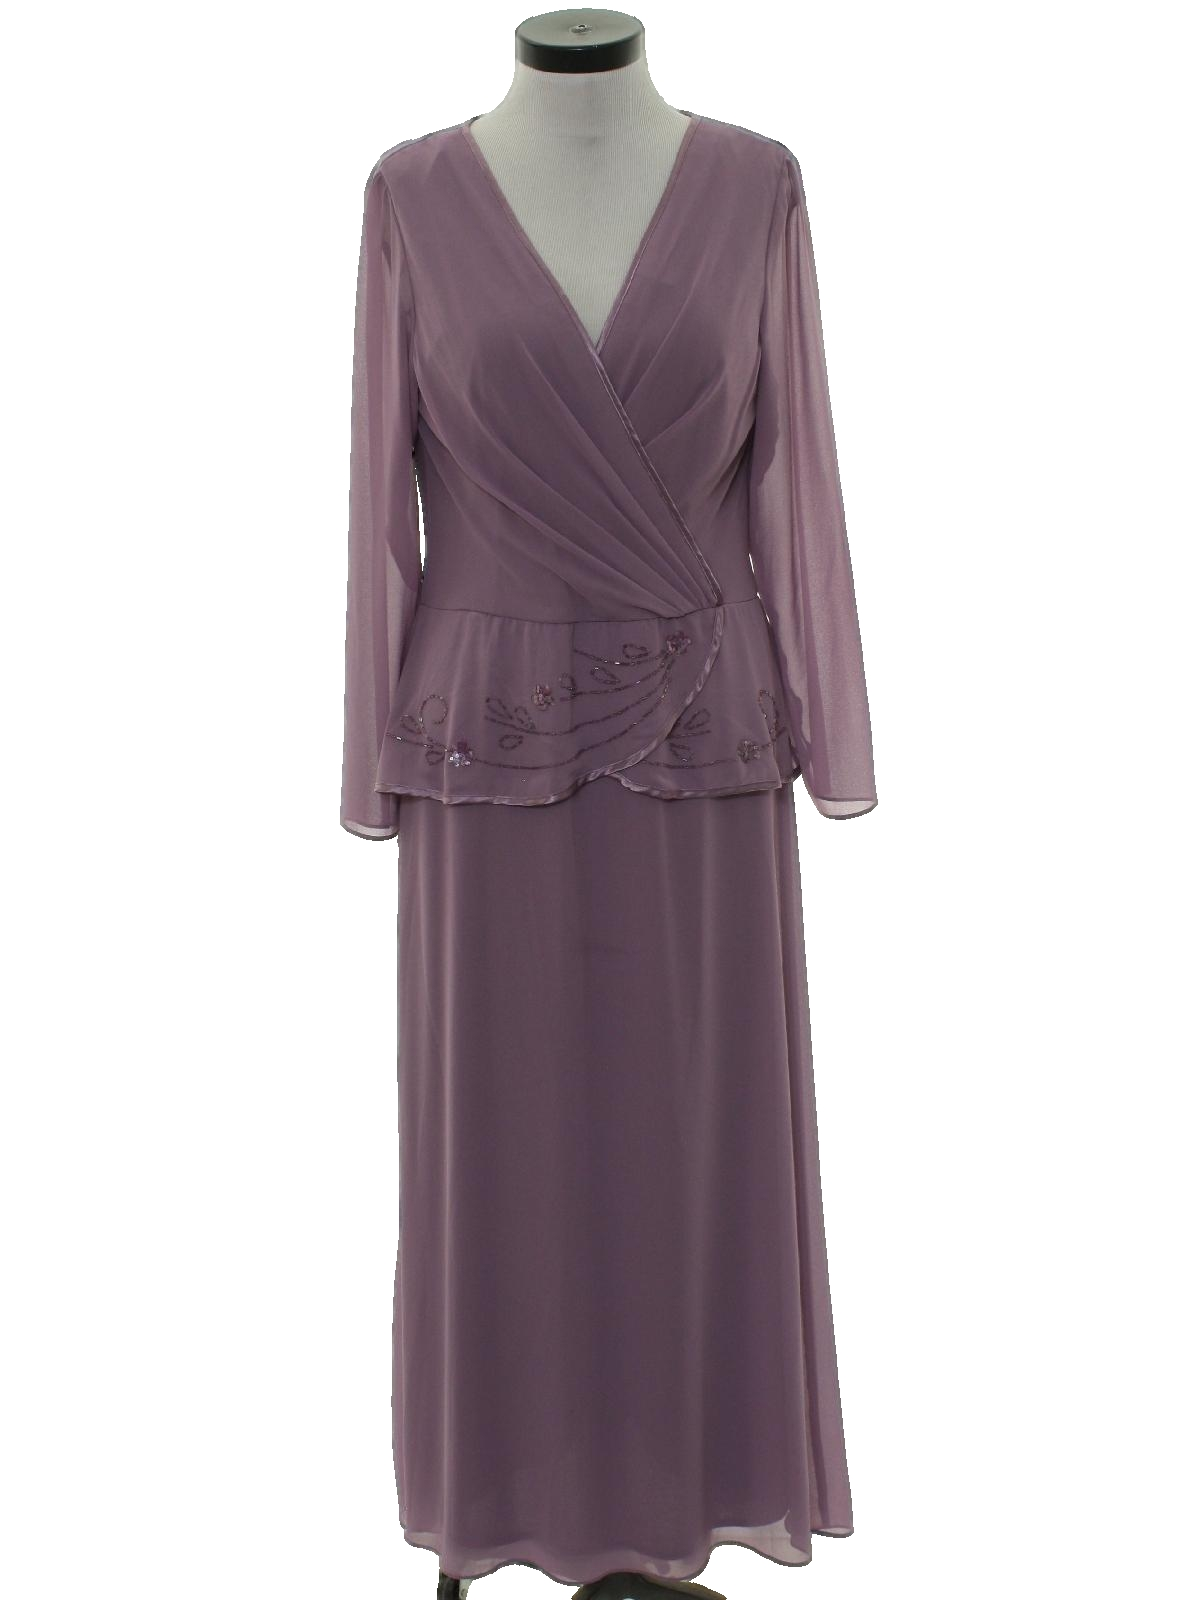 70s Vintage Patra Cocktail Dress 70s Patra Womens Plum Polyester